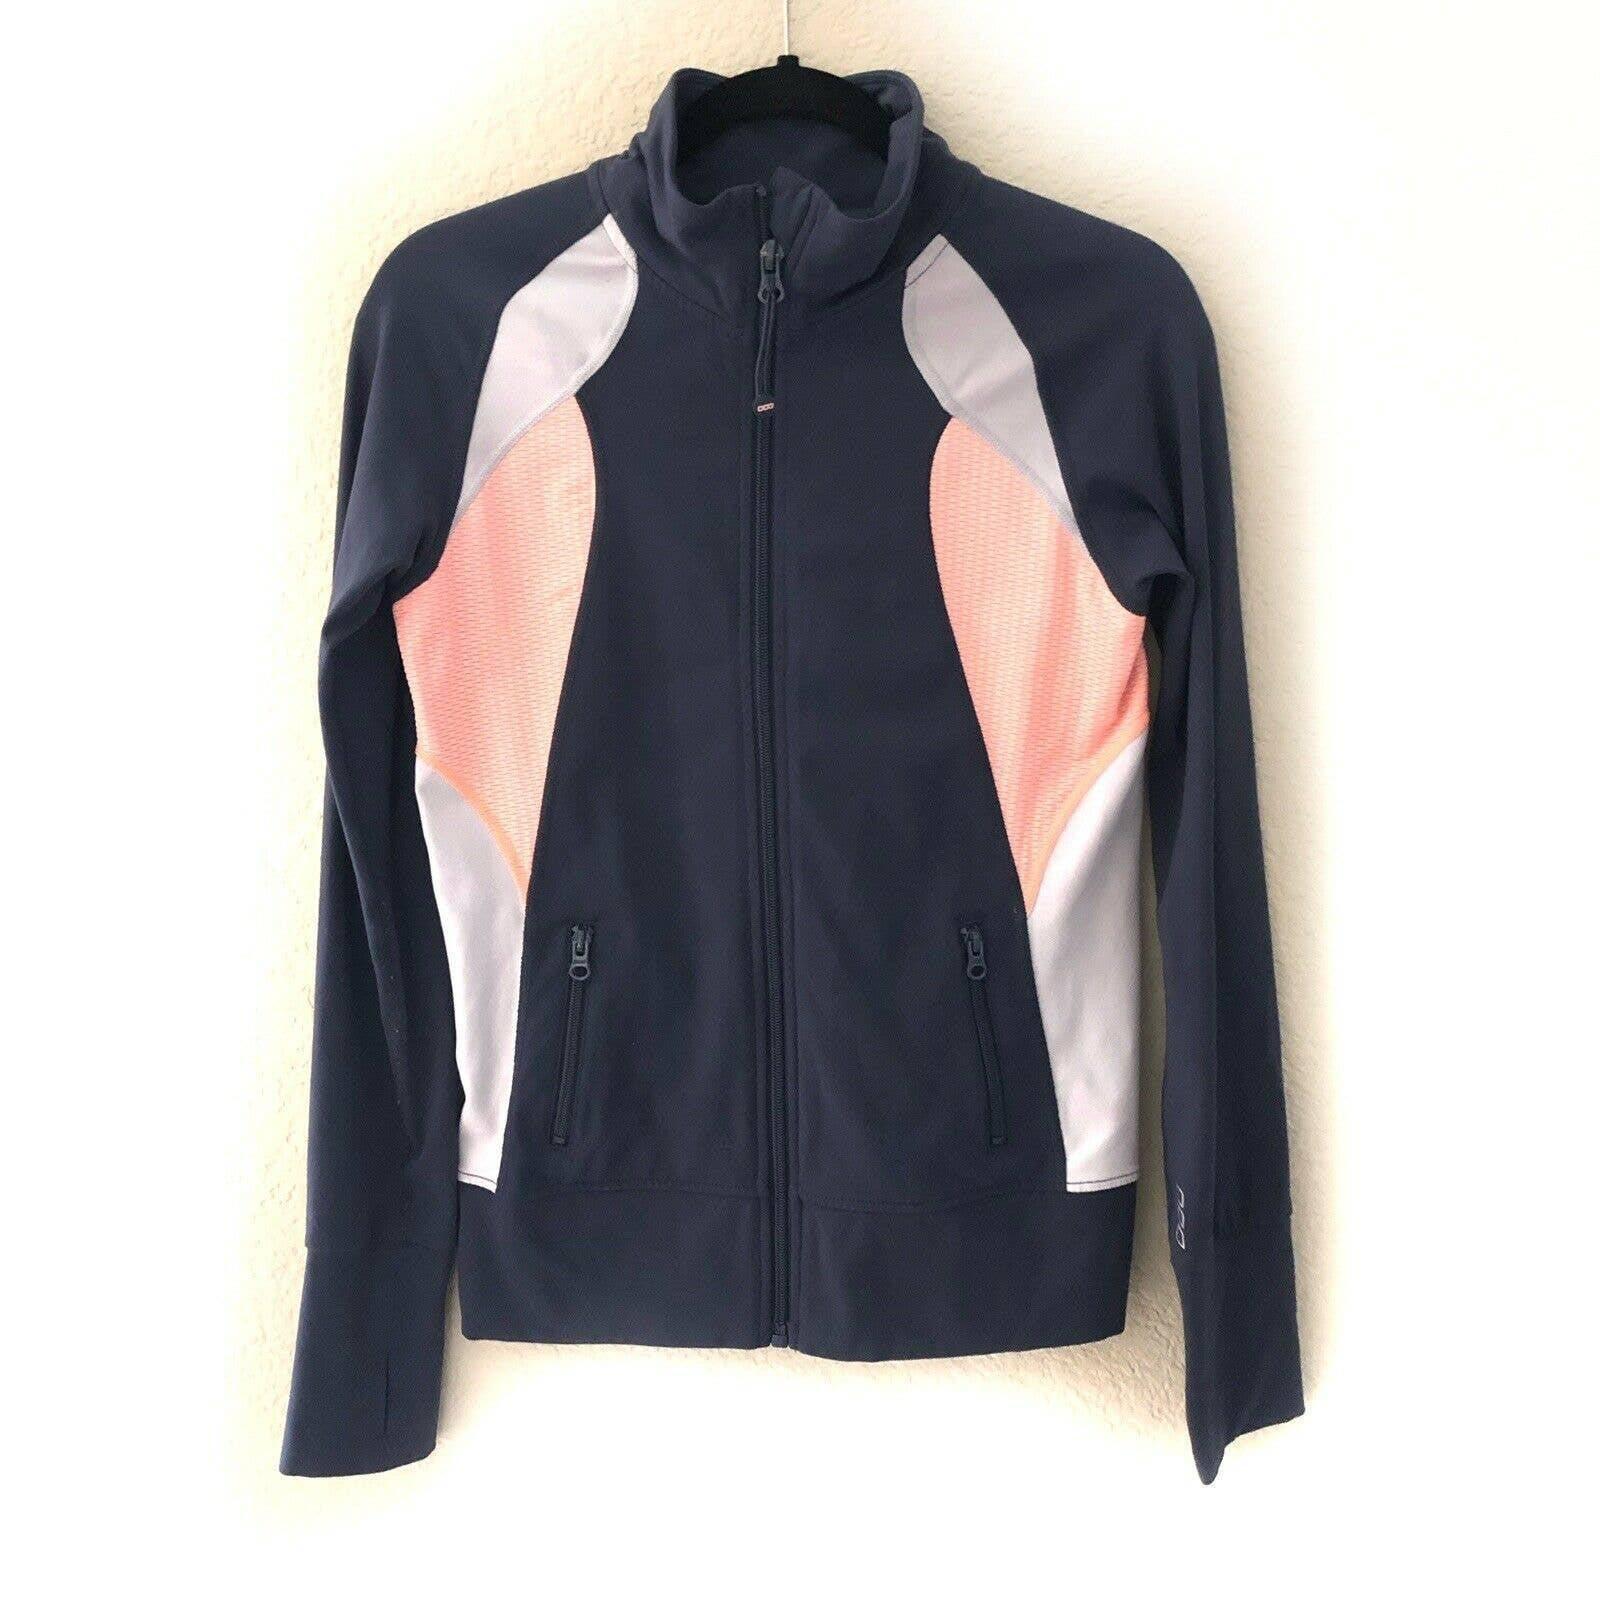 Lorna Jane Gray Activewear Jacket Yoga